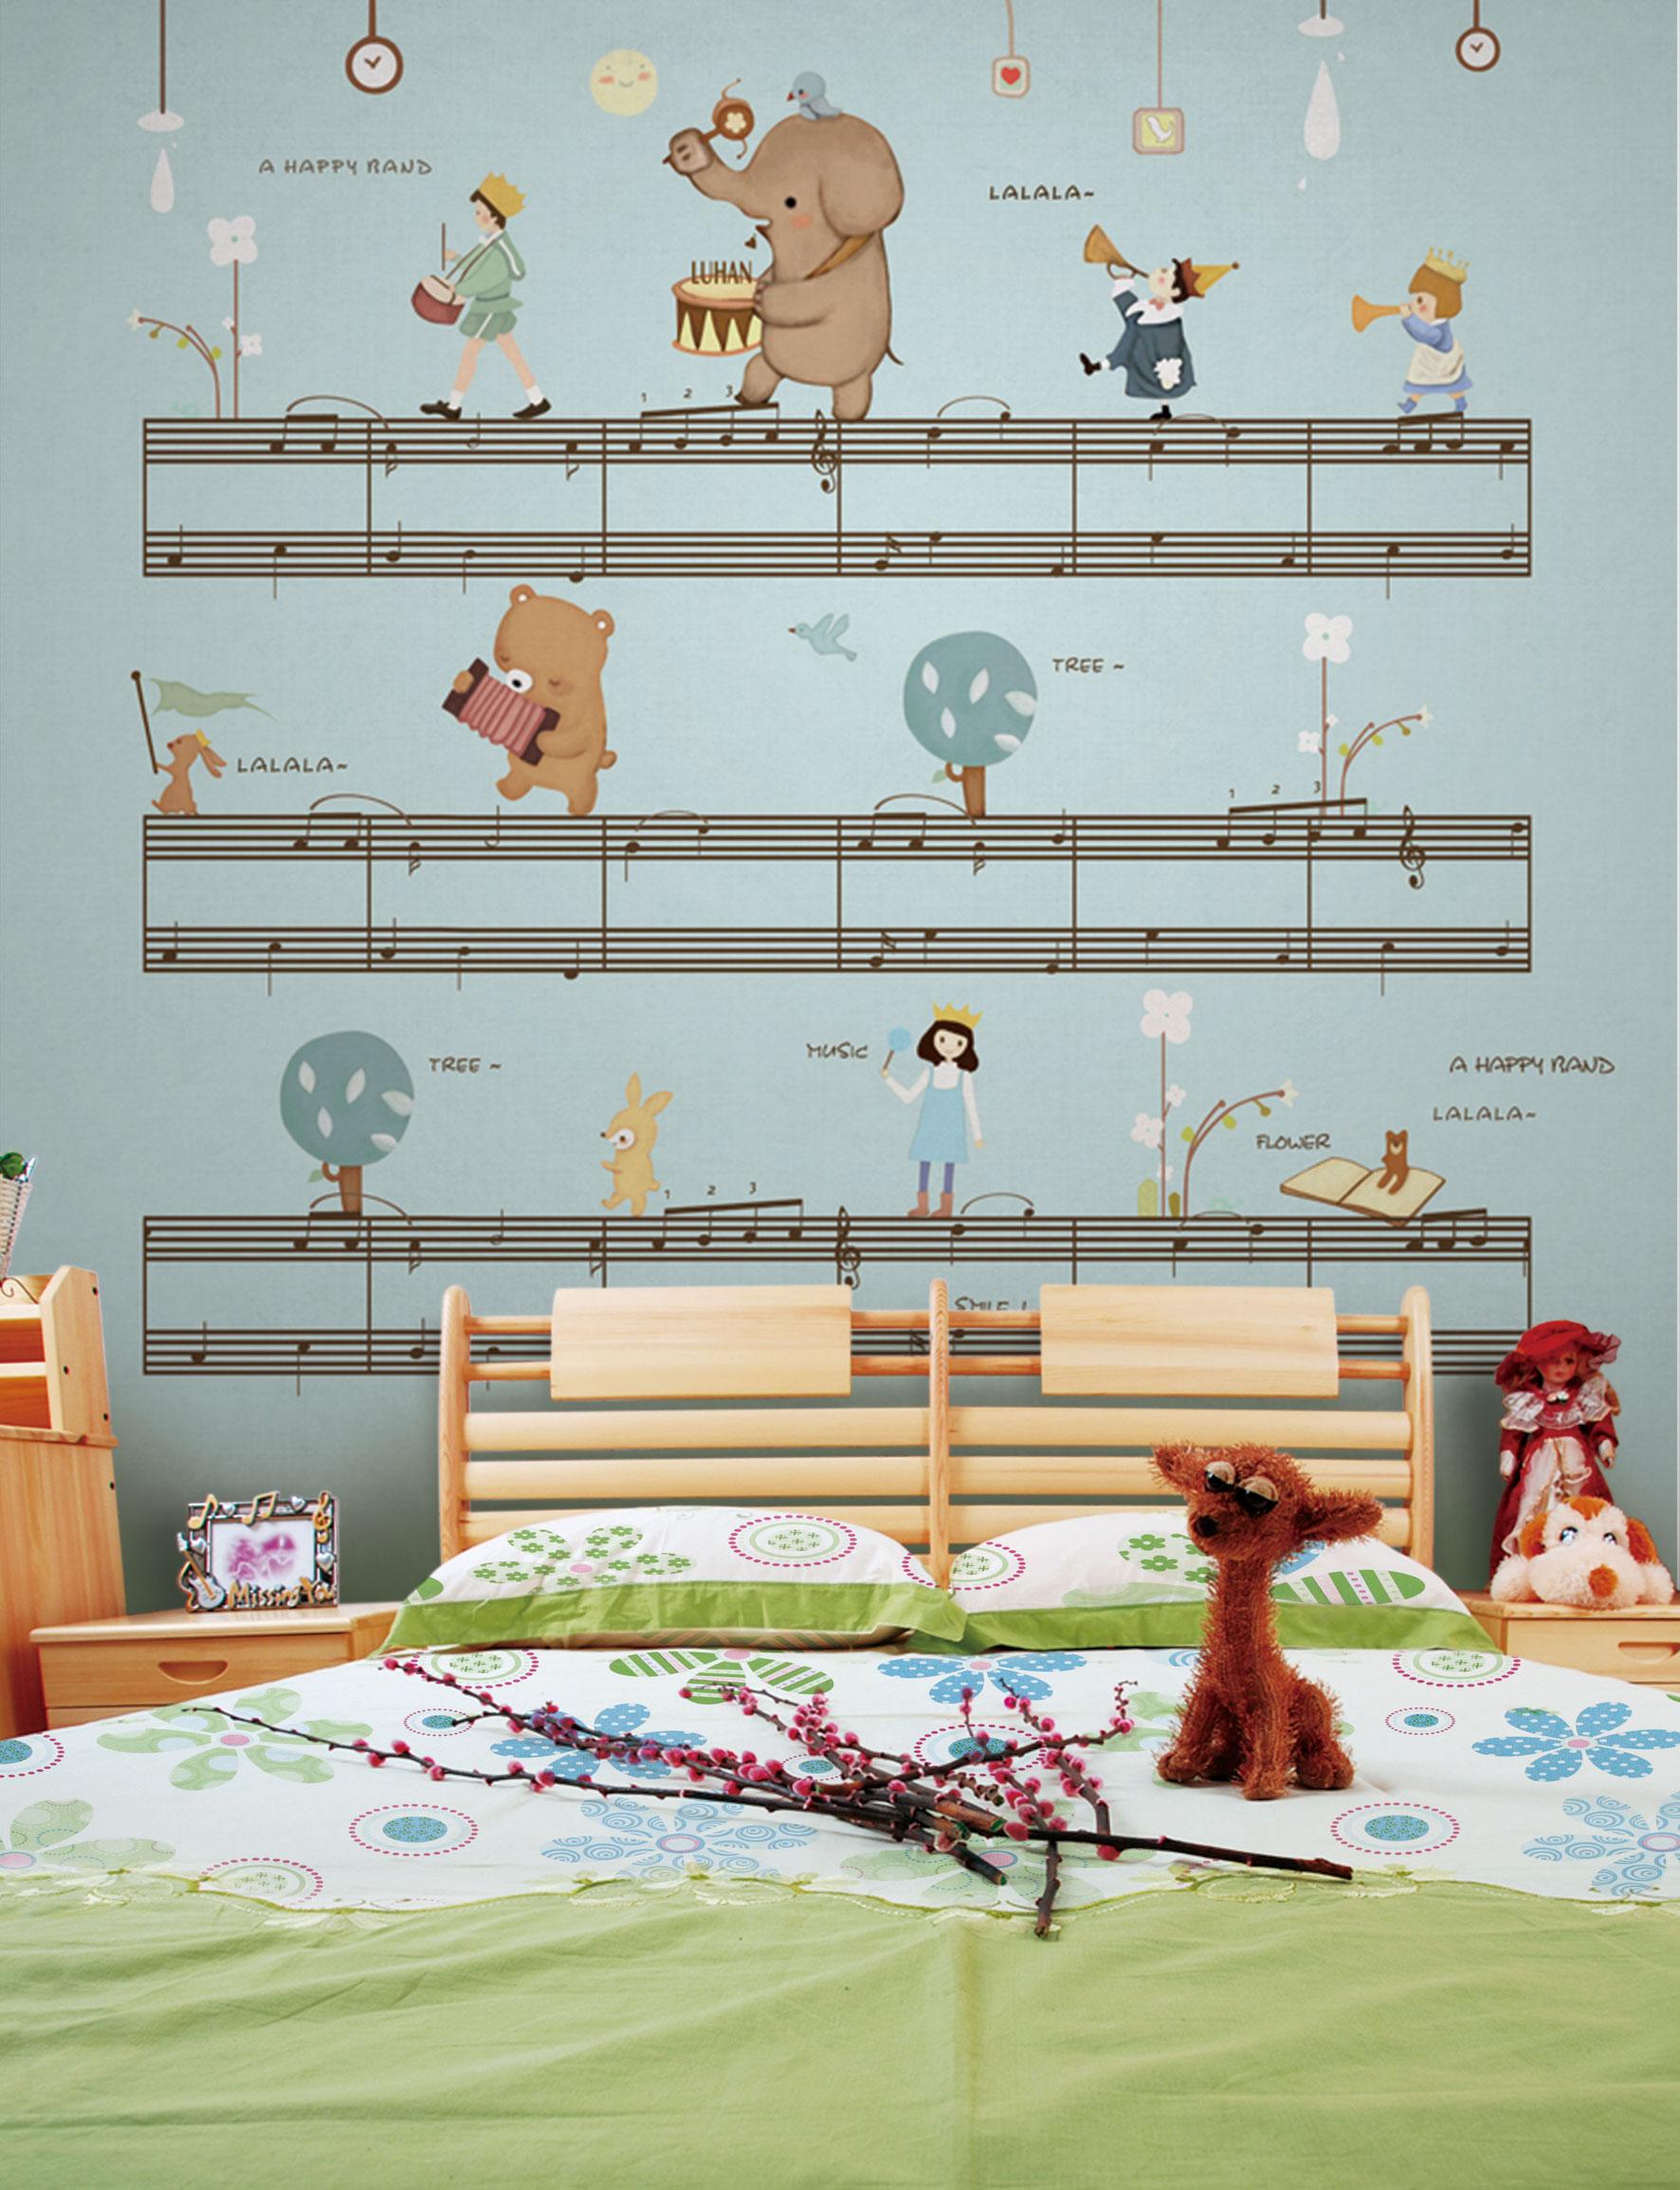 xr315儿童宝贝卡通大象五线谱女孩熊(2)